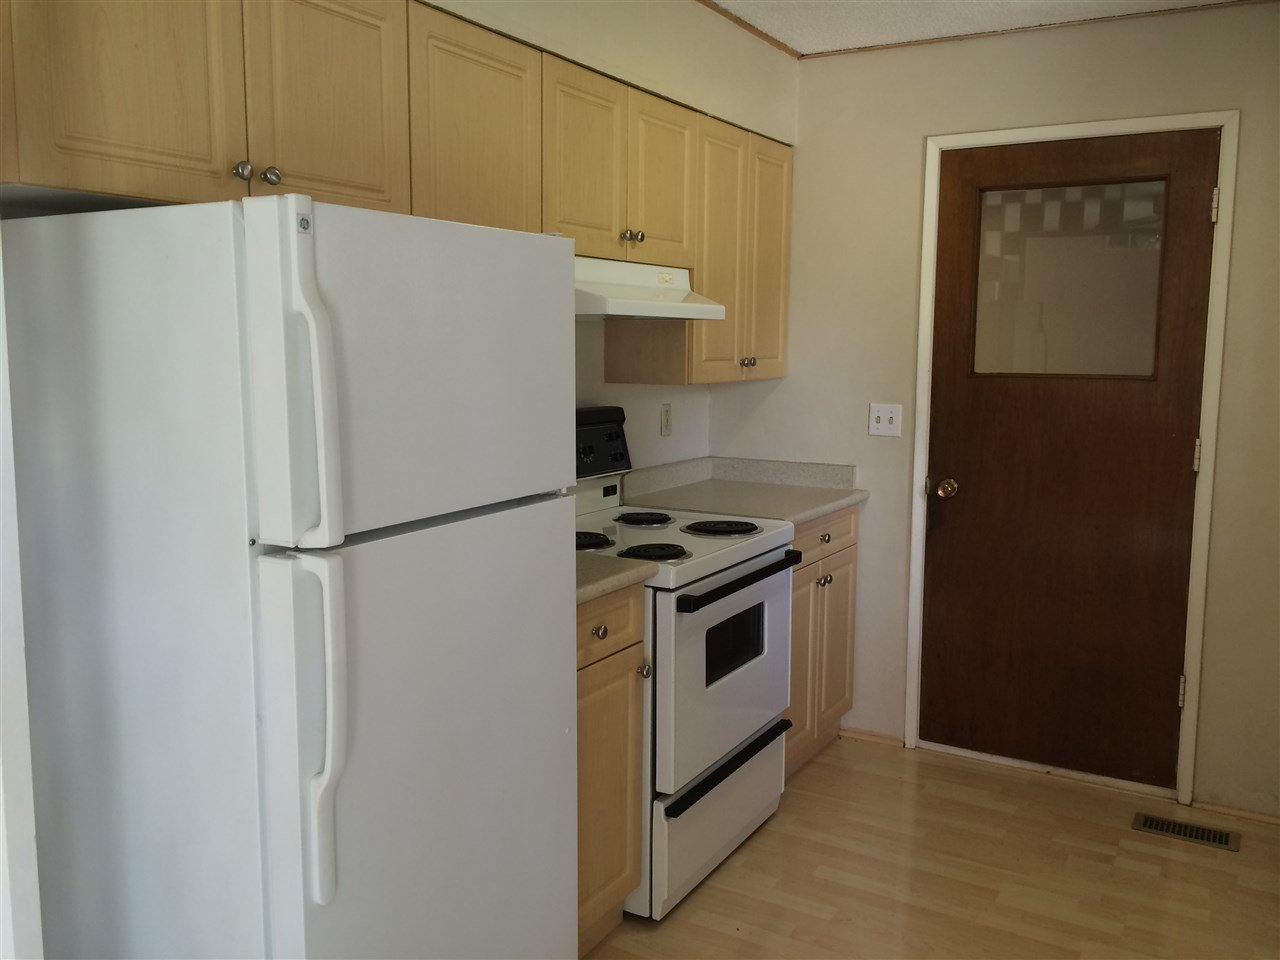 Photo 3: Photos: 12361 BONSON Road in Pitt Meadows: Mid Meadows House for sale : MLS®# R2078094